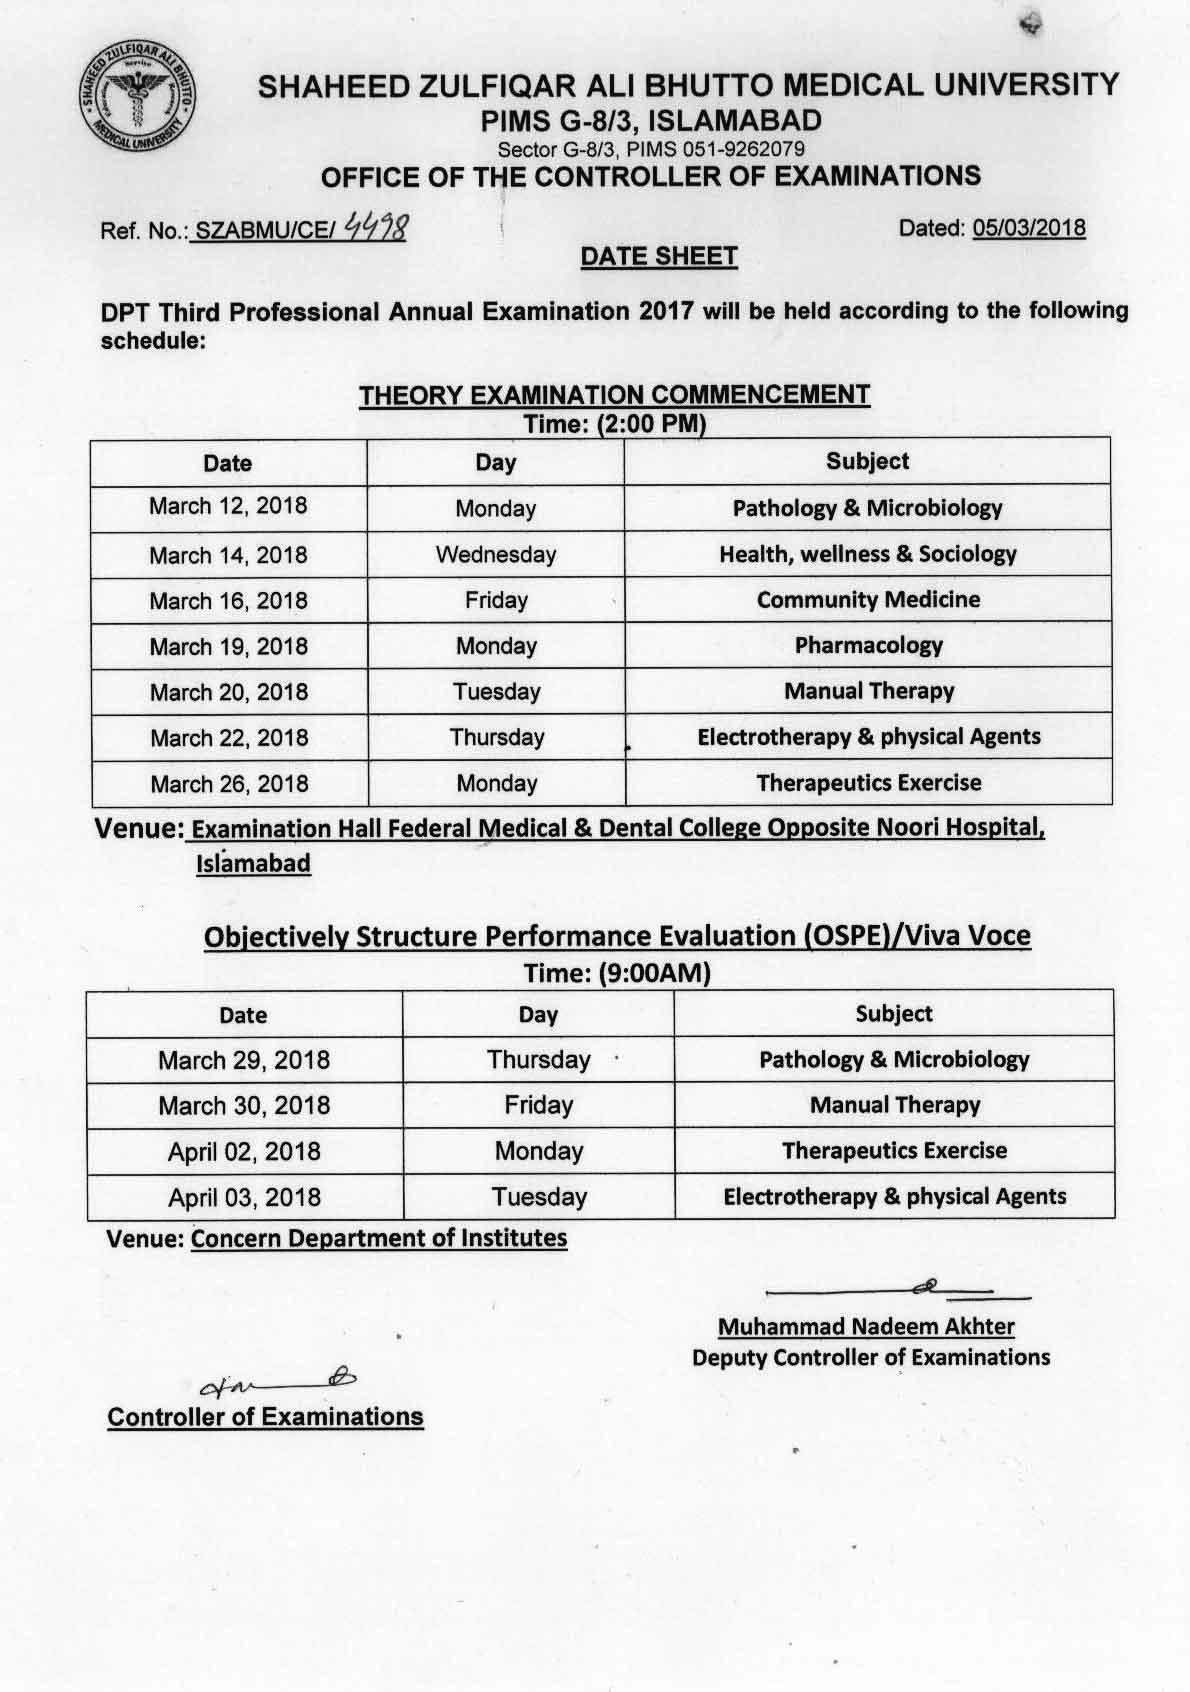 Date sheet - DPT Supplementary Examinations 2017